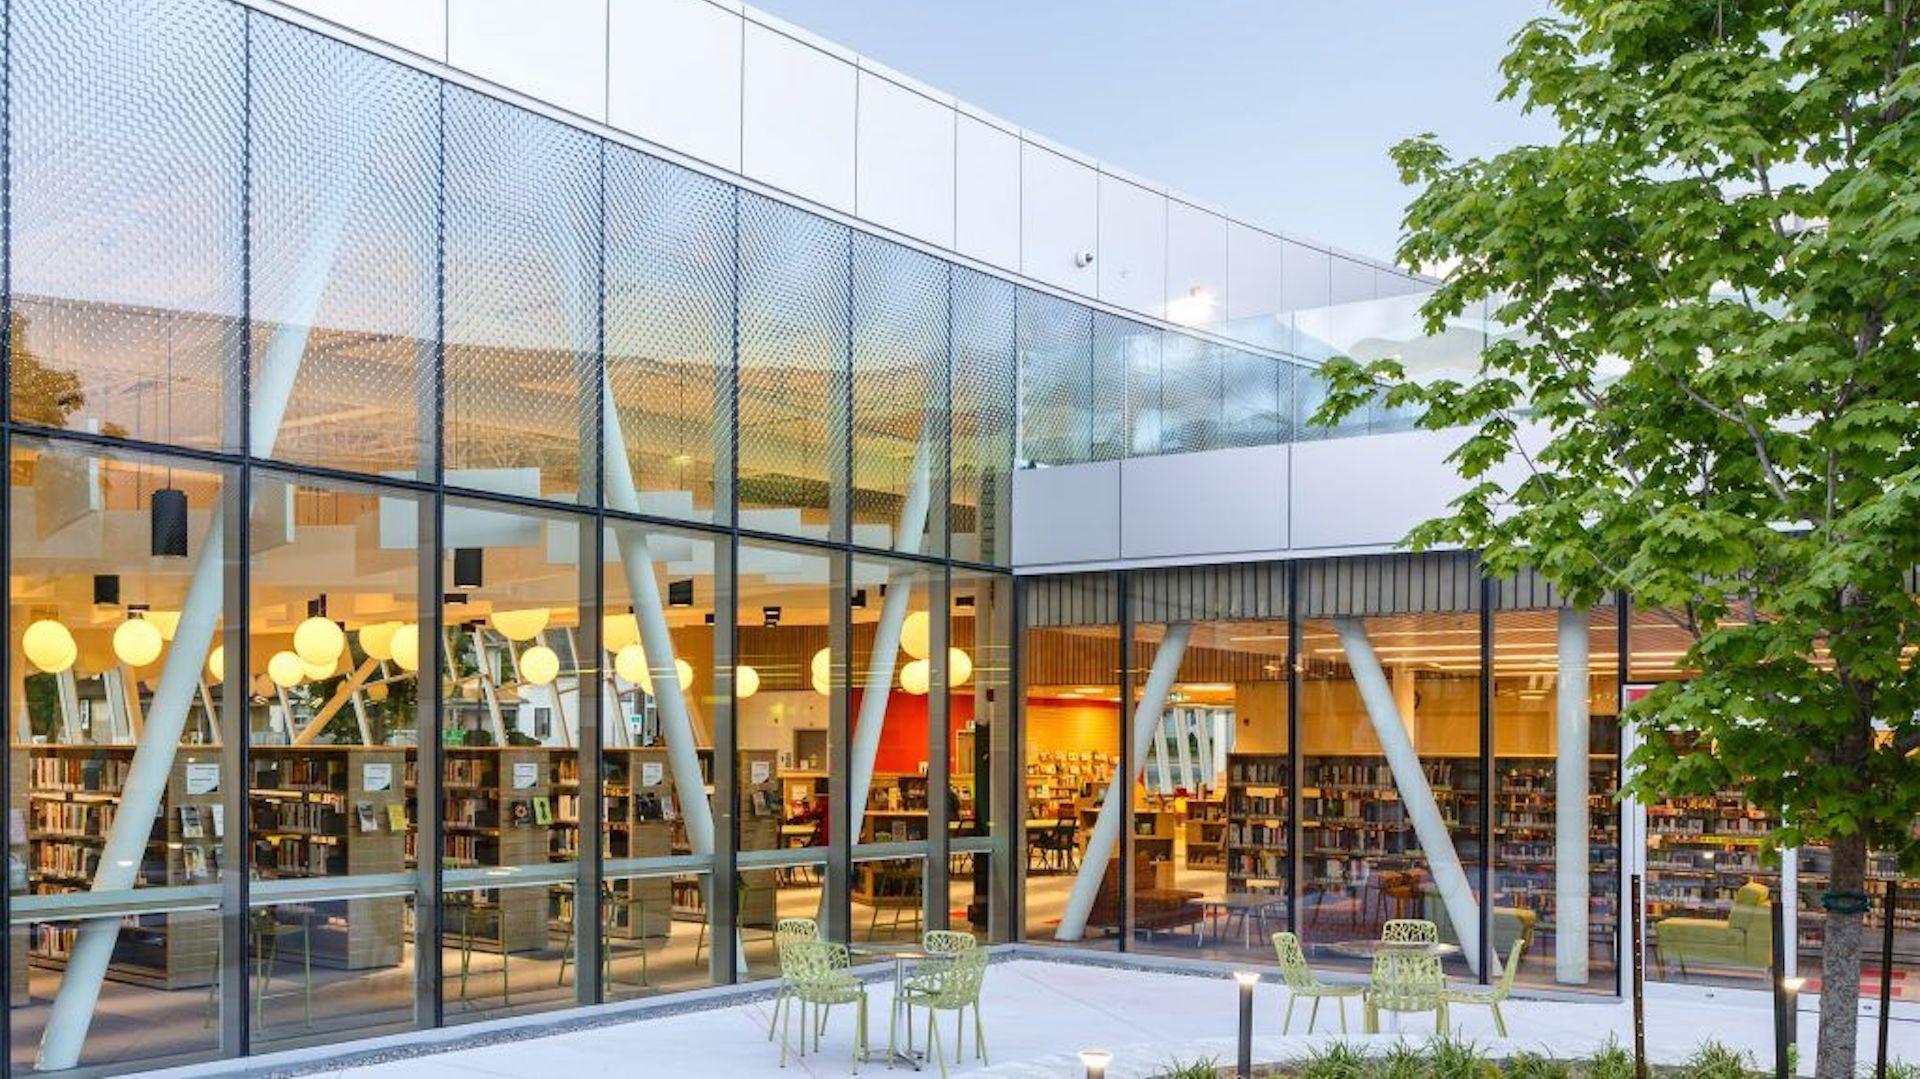 toronto-biblioteca-15102016in3